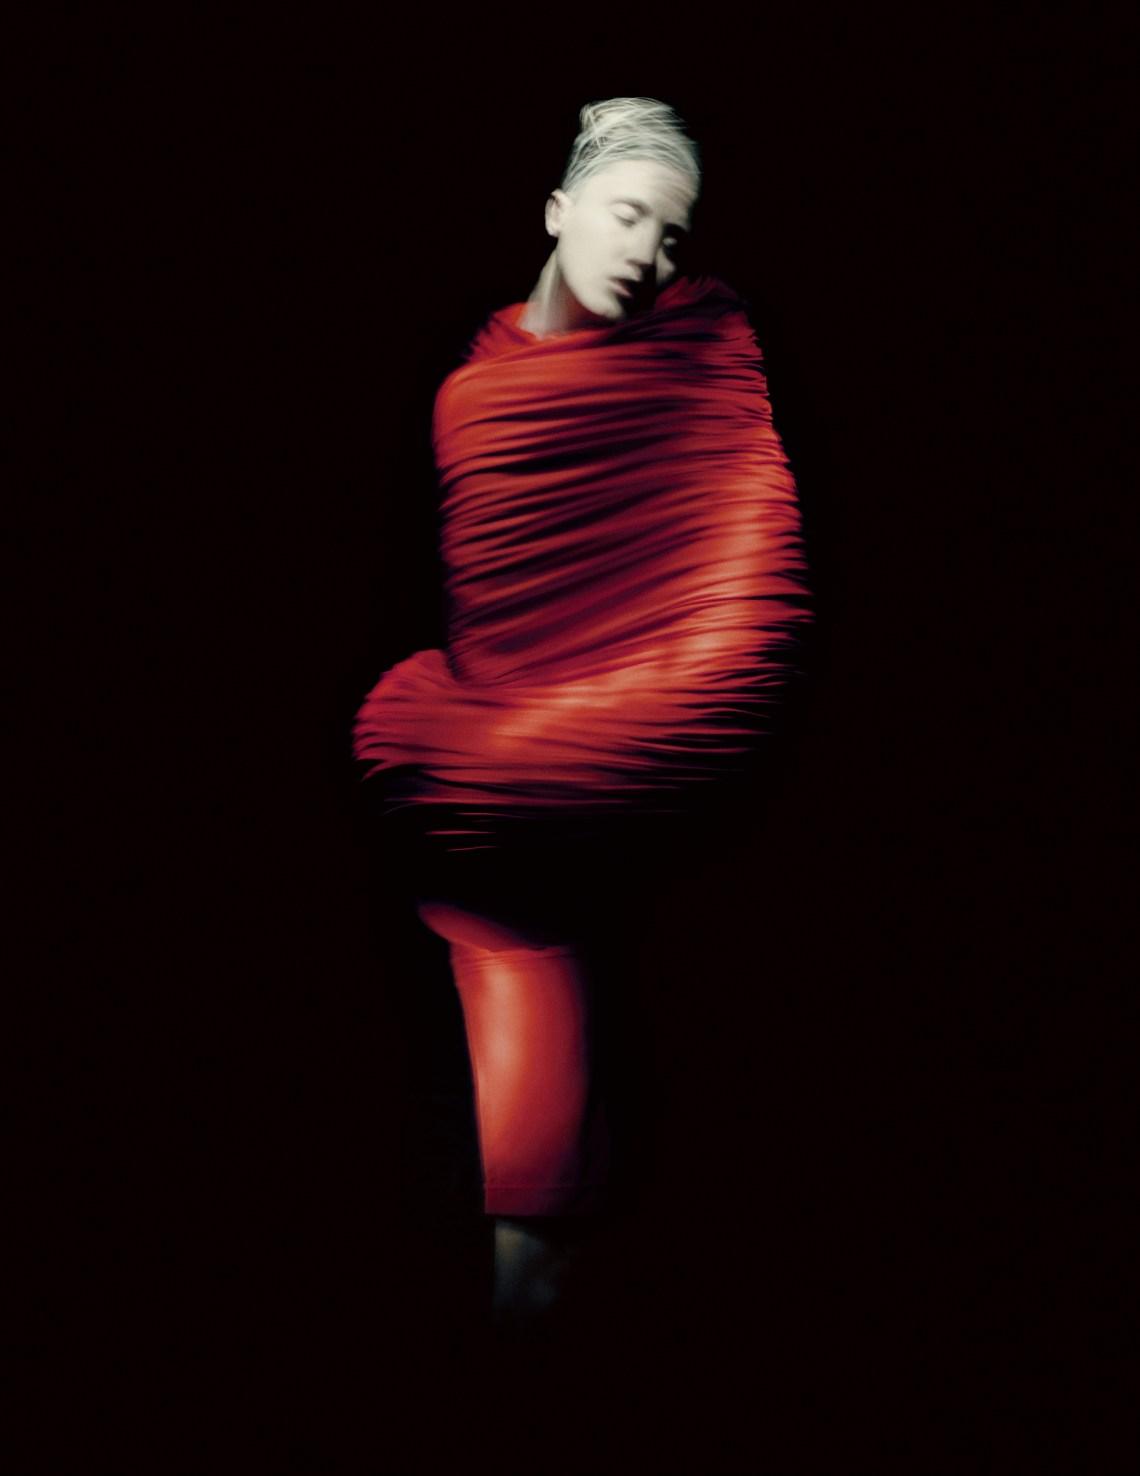 04.BodyMeetsDress DressMeetsBodySpring1997